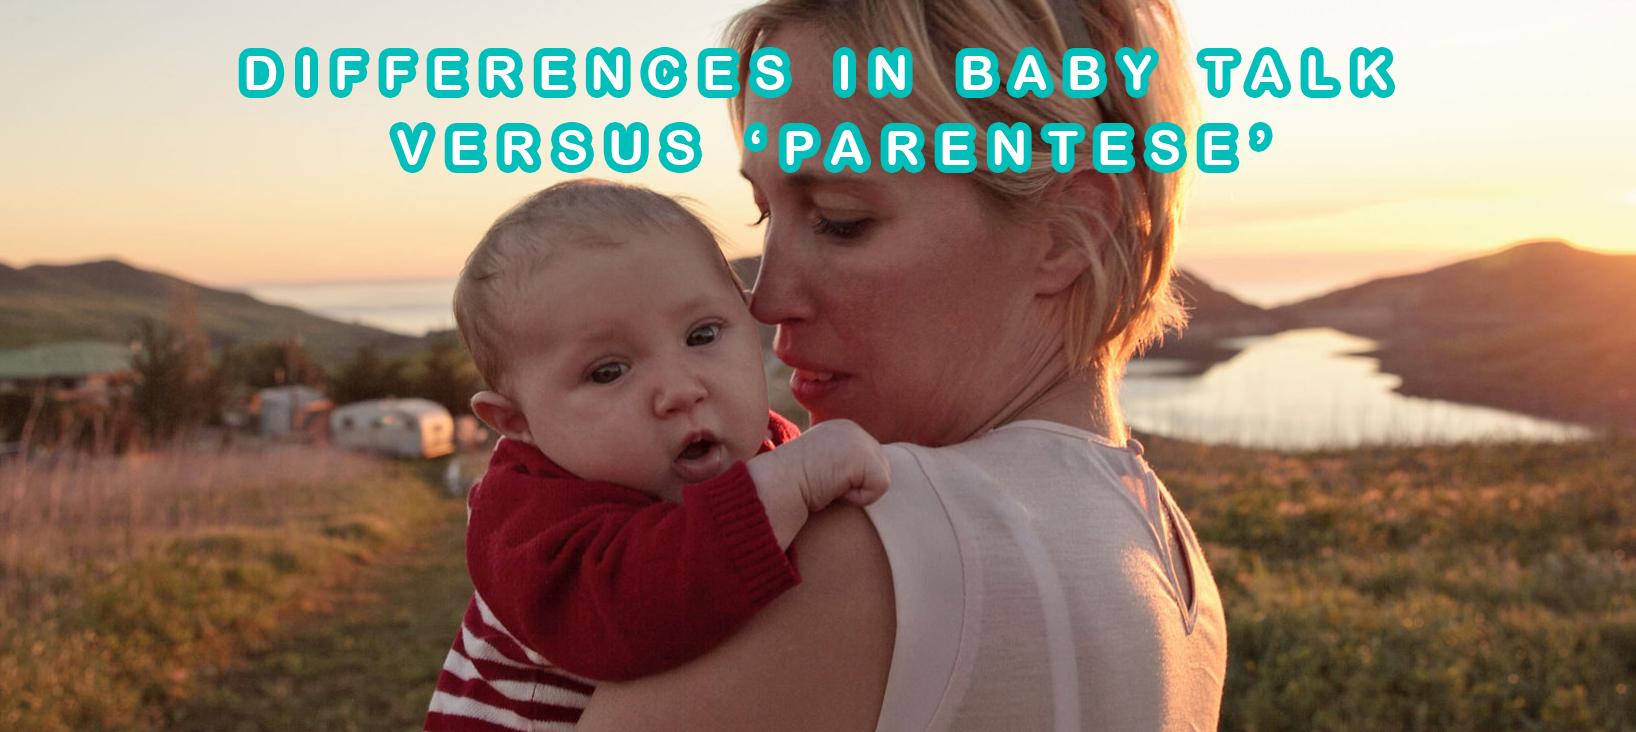 DIFFERENCES IN BABY TALK VERSUS 'PARENTESE'